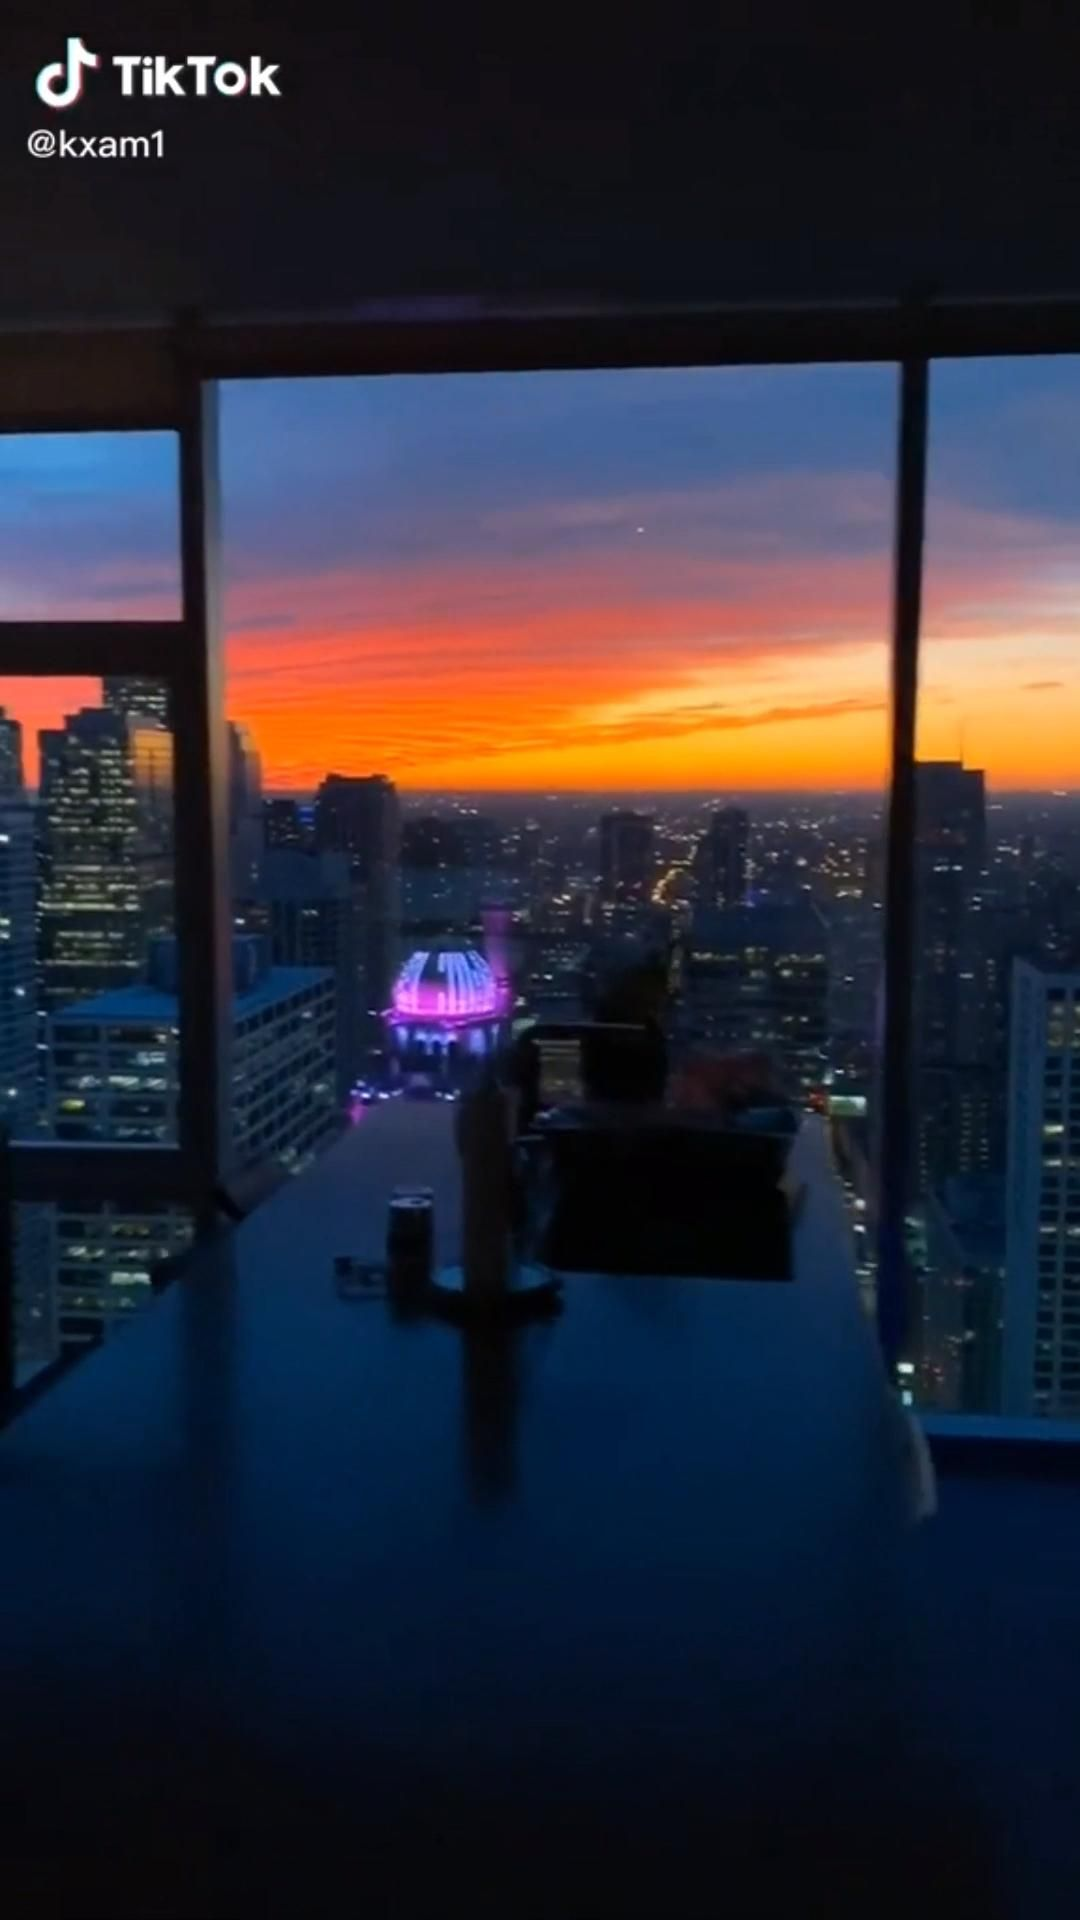 Aesthetic Tiktok Video City View Apartment City View Night Penthouse View